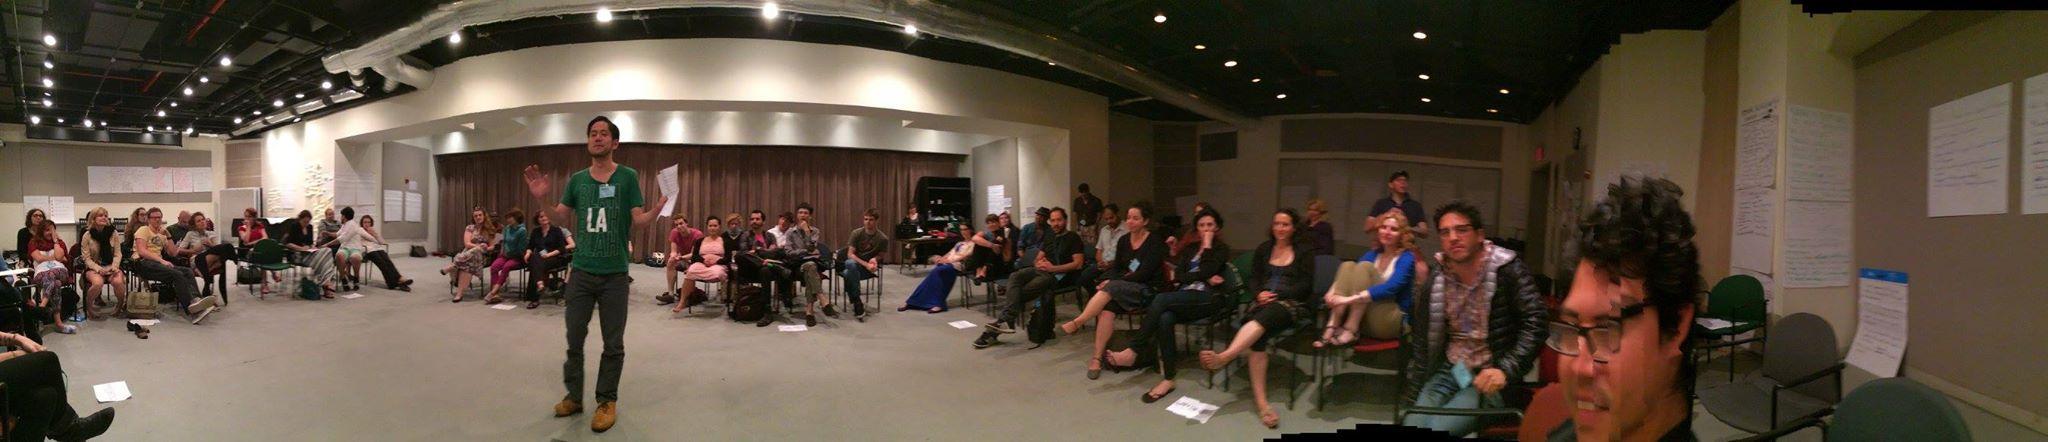 Lincoln center_prezentare grupuri de lucru.jpg